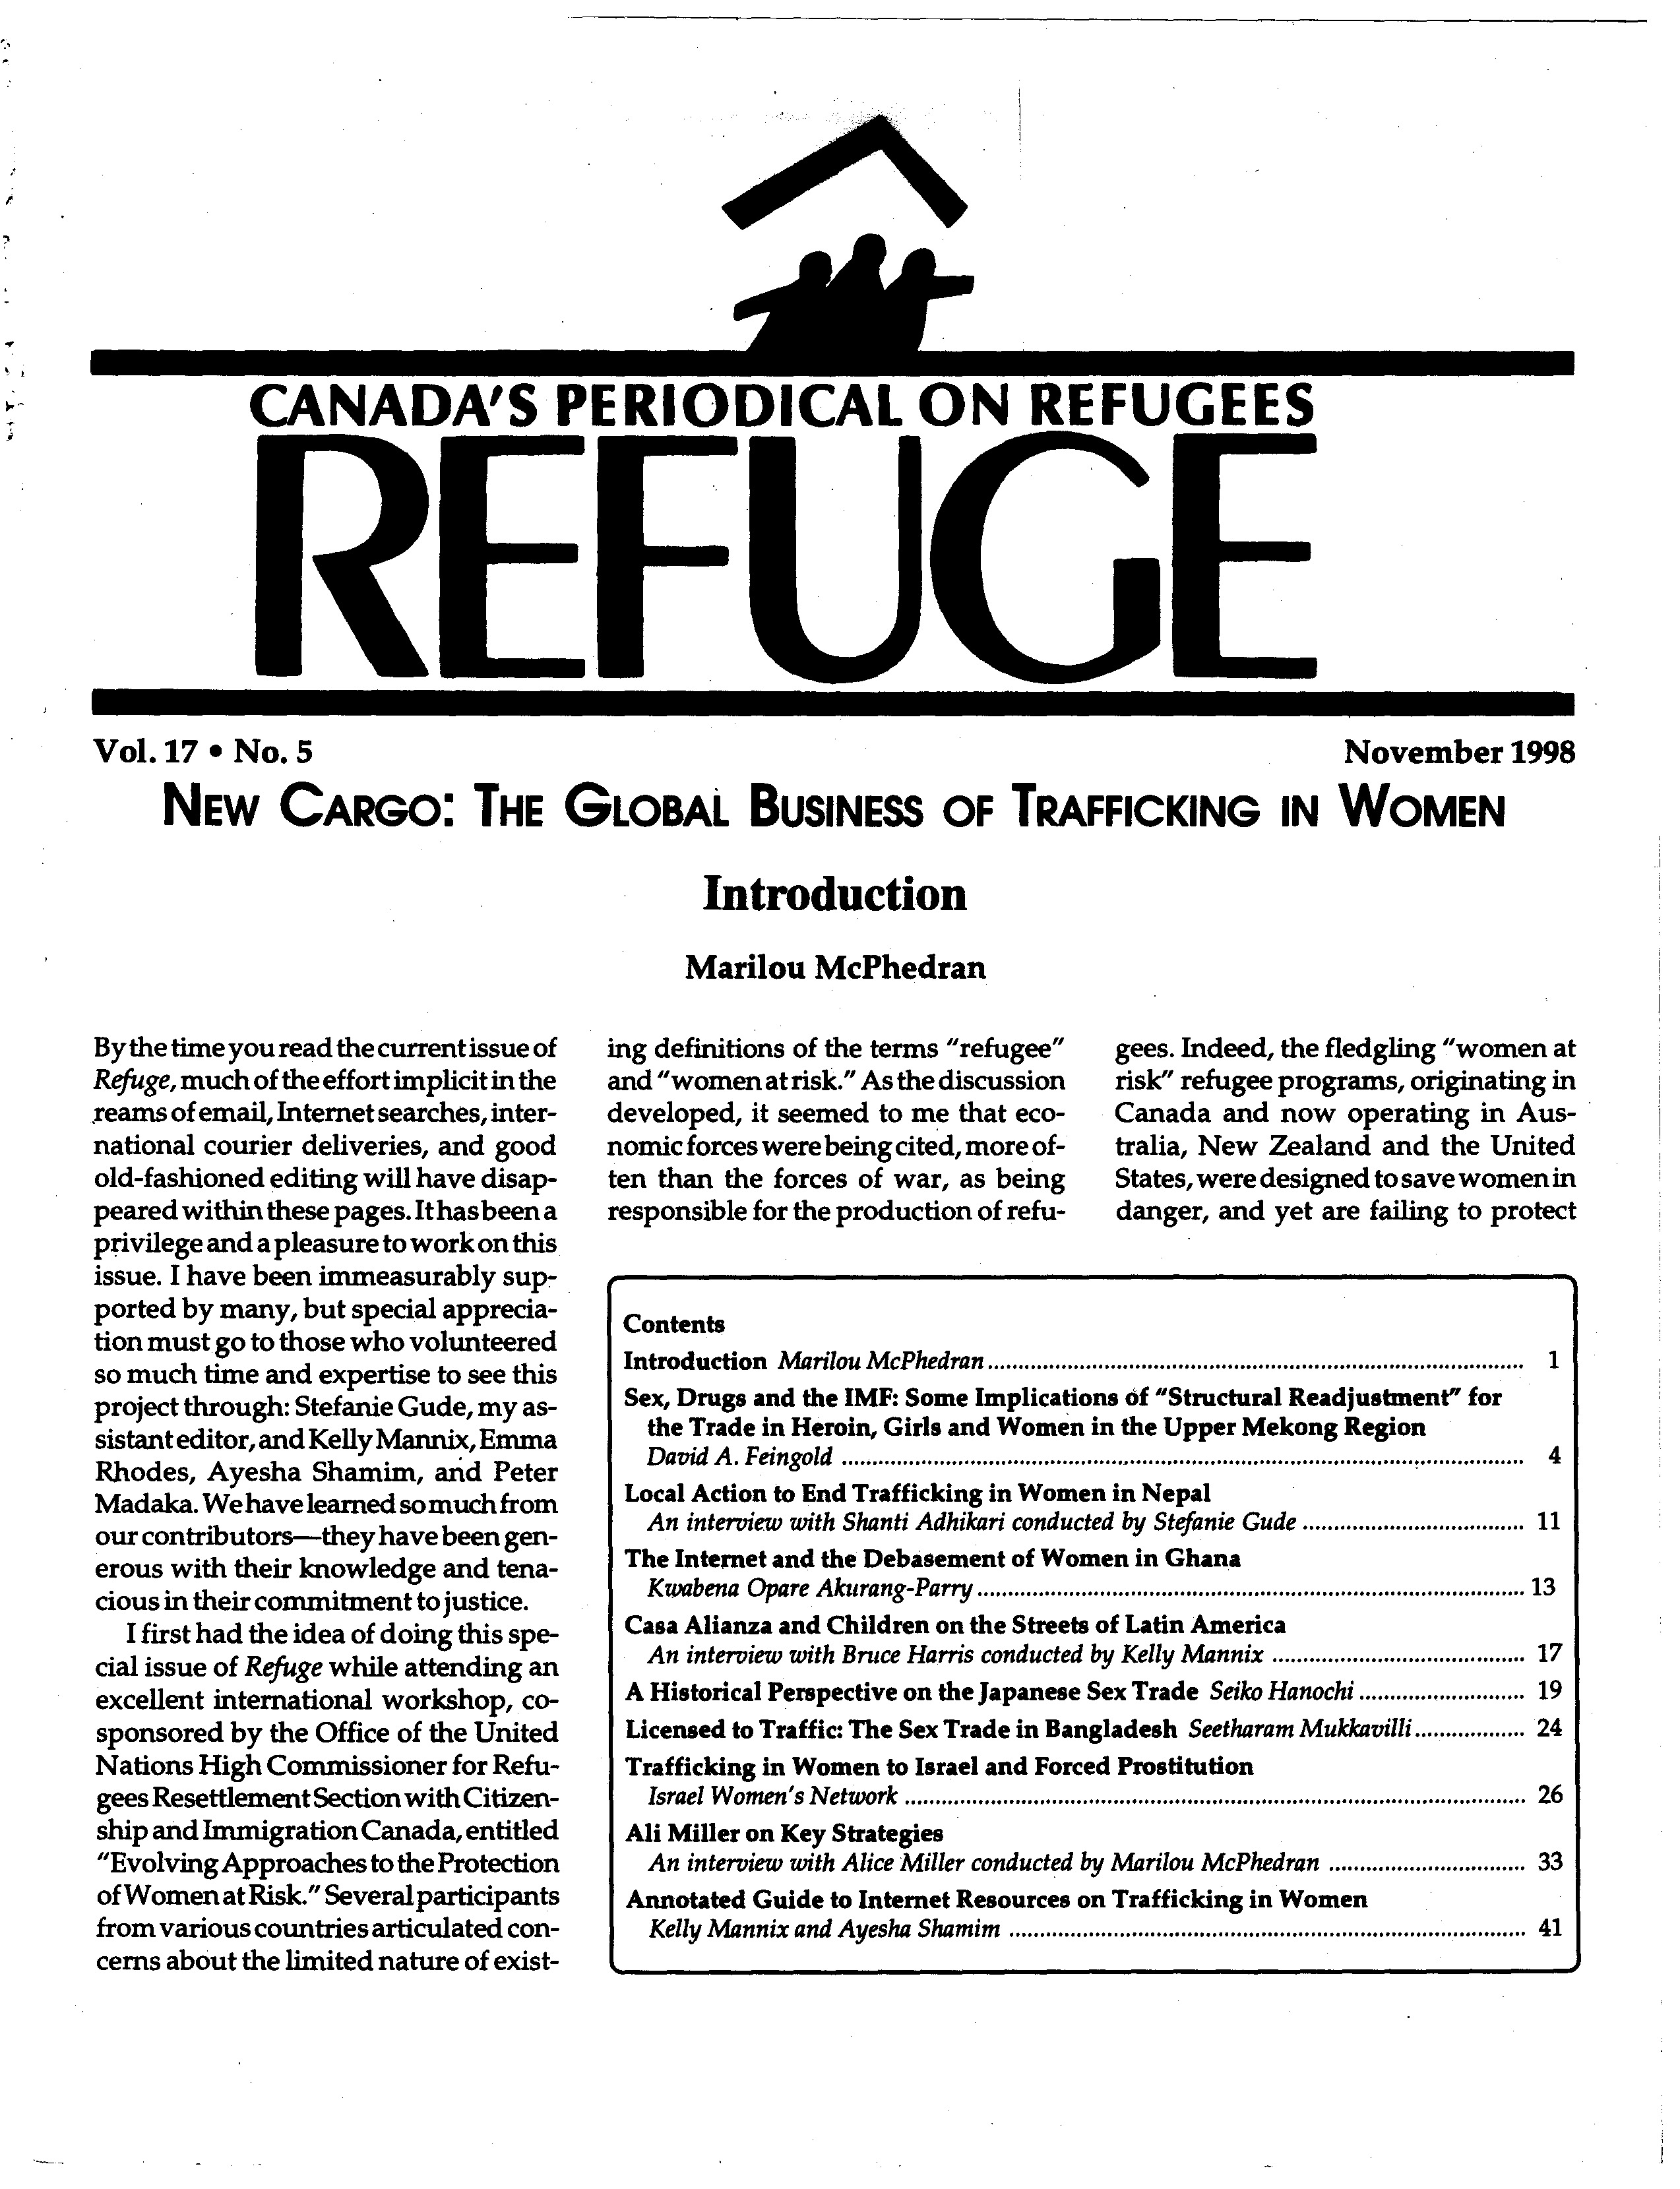 first page Refuge vol. 17.5 1998